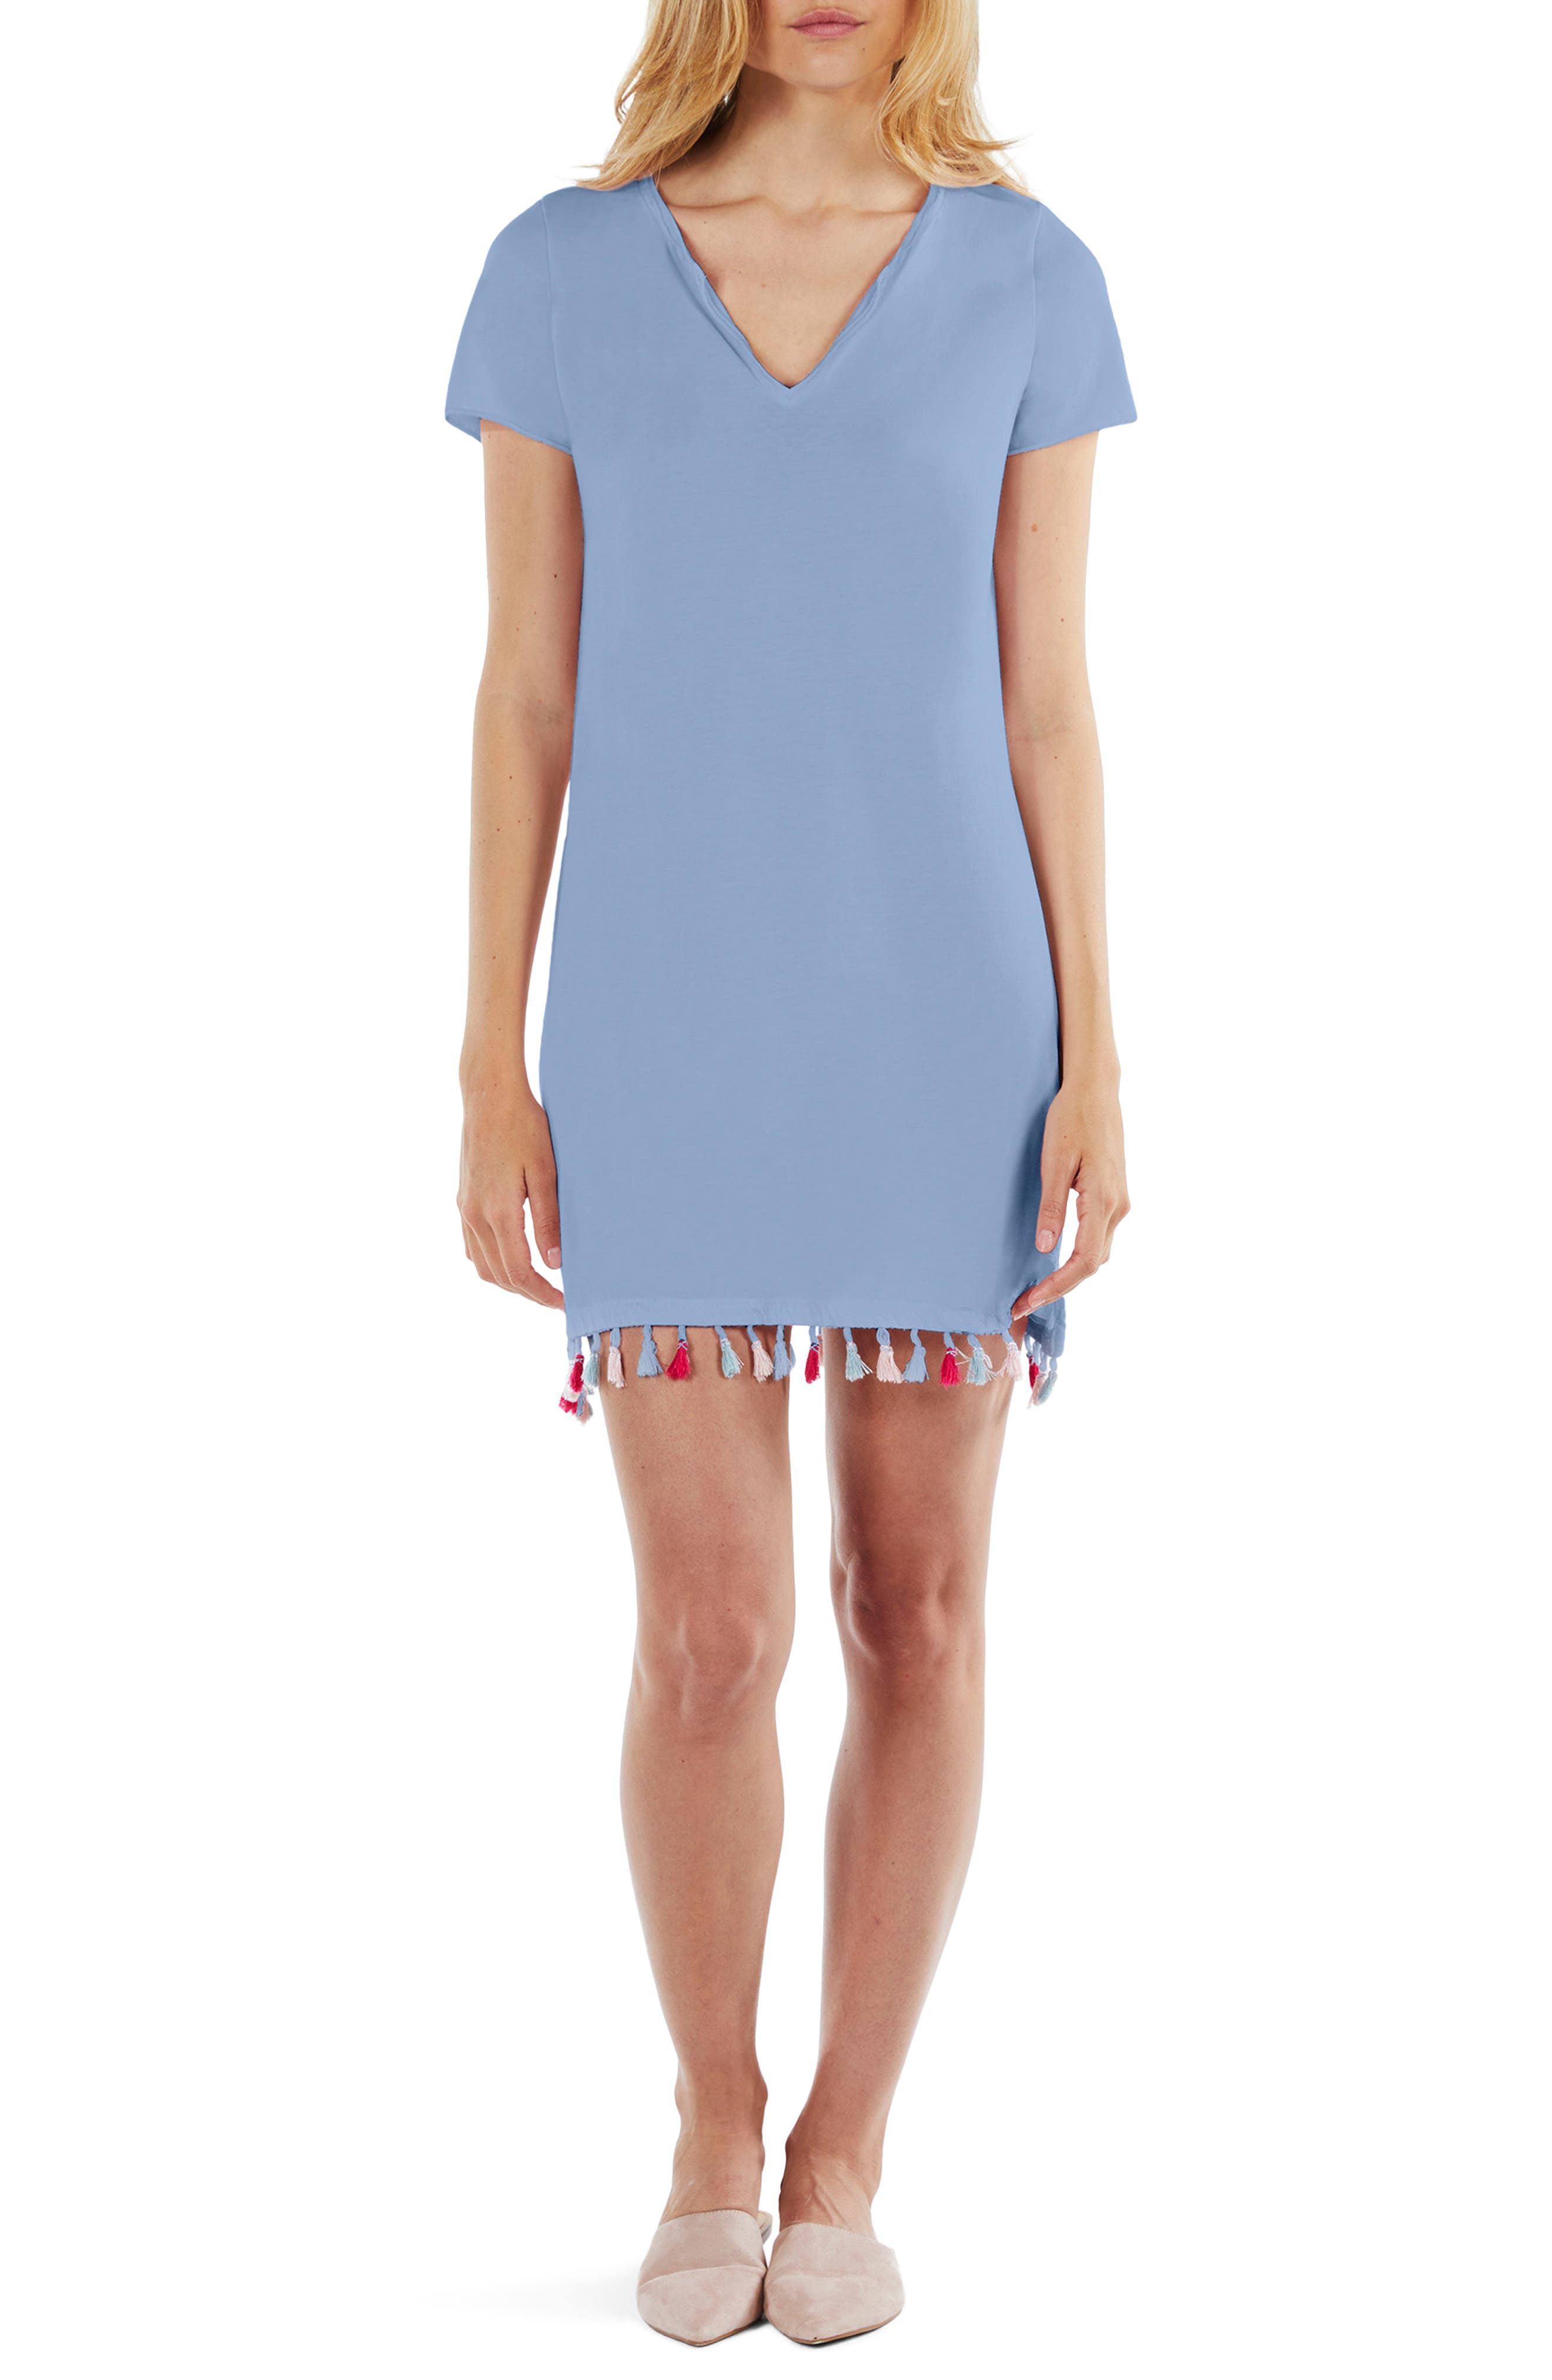 Tassel Fringe Shift Dress,                             Main thumbnail 1, color,                             Sea Breeze